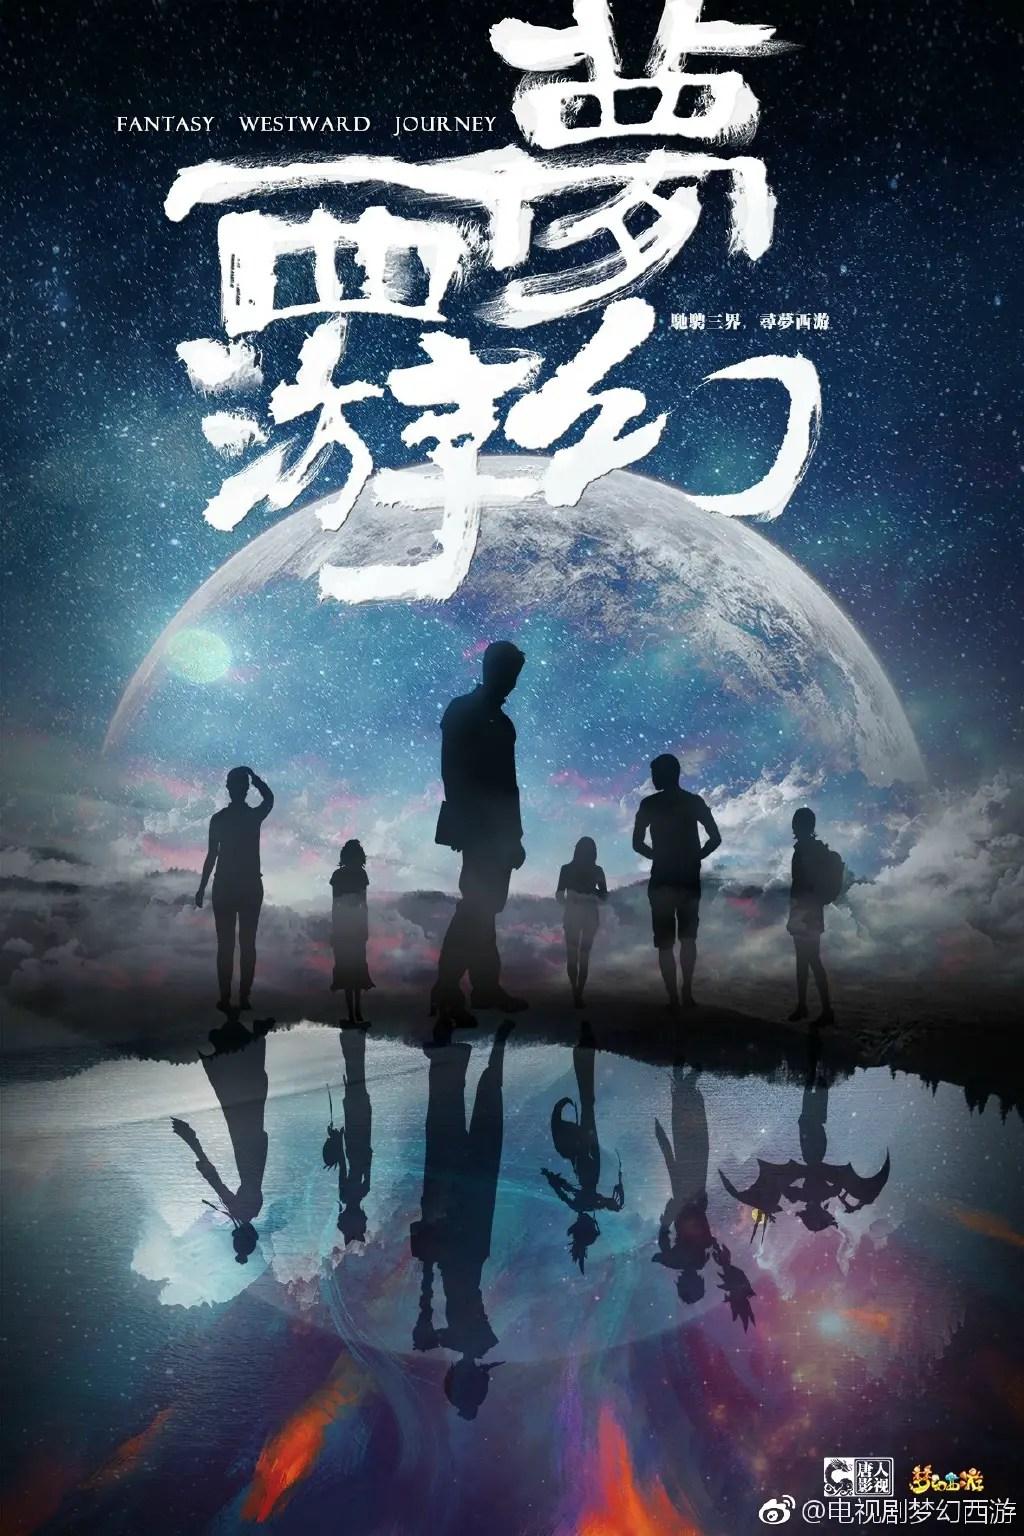 Fantasy Westward Journey Chinese Drama Poster